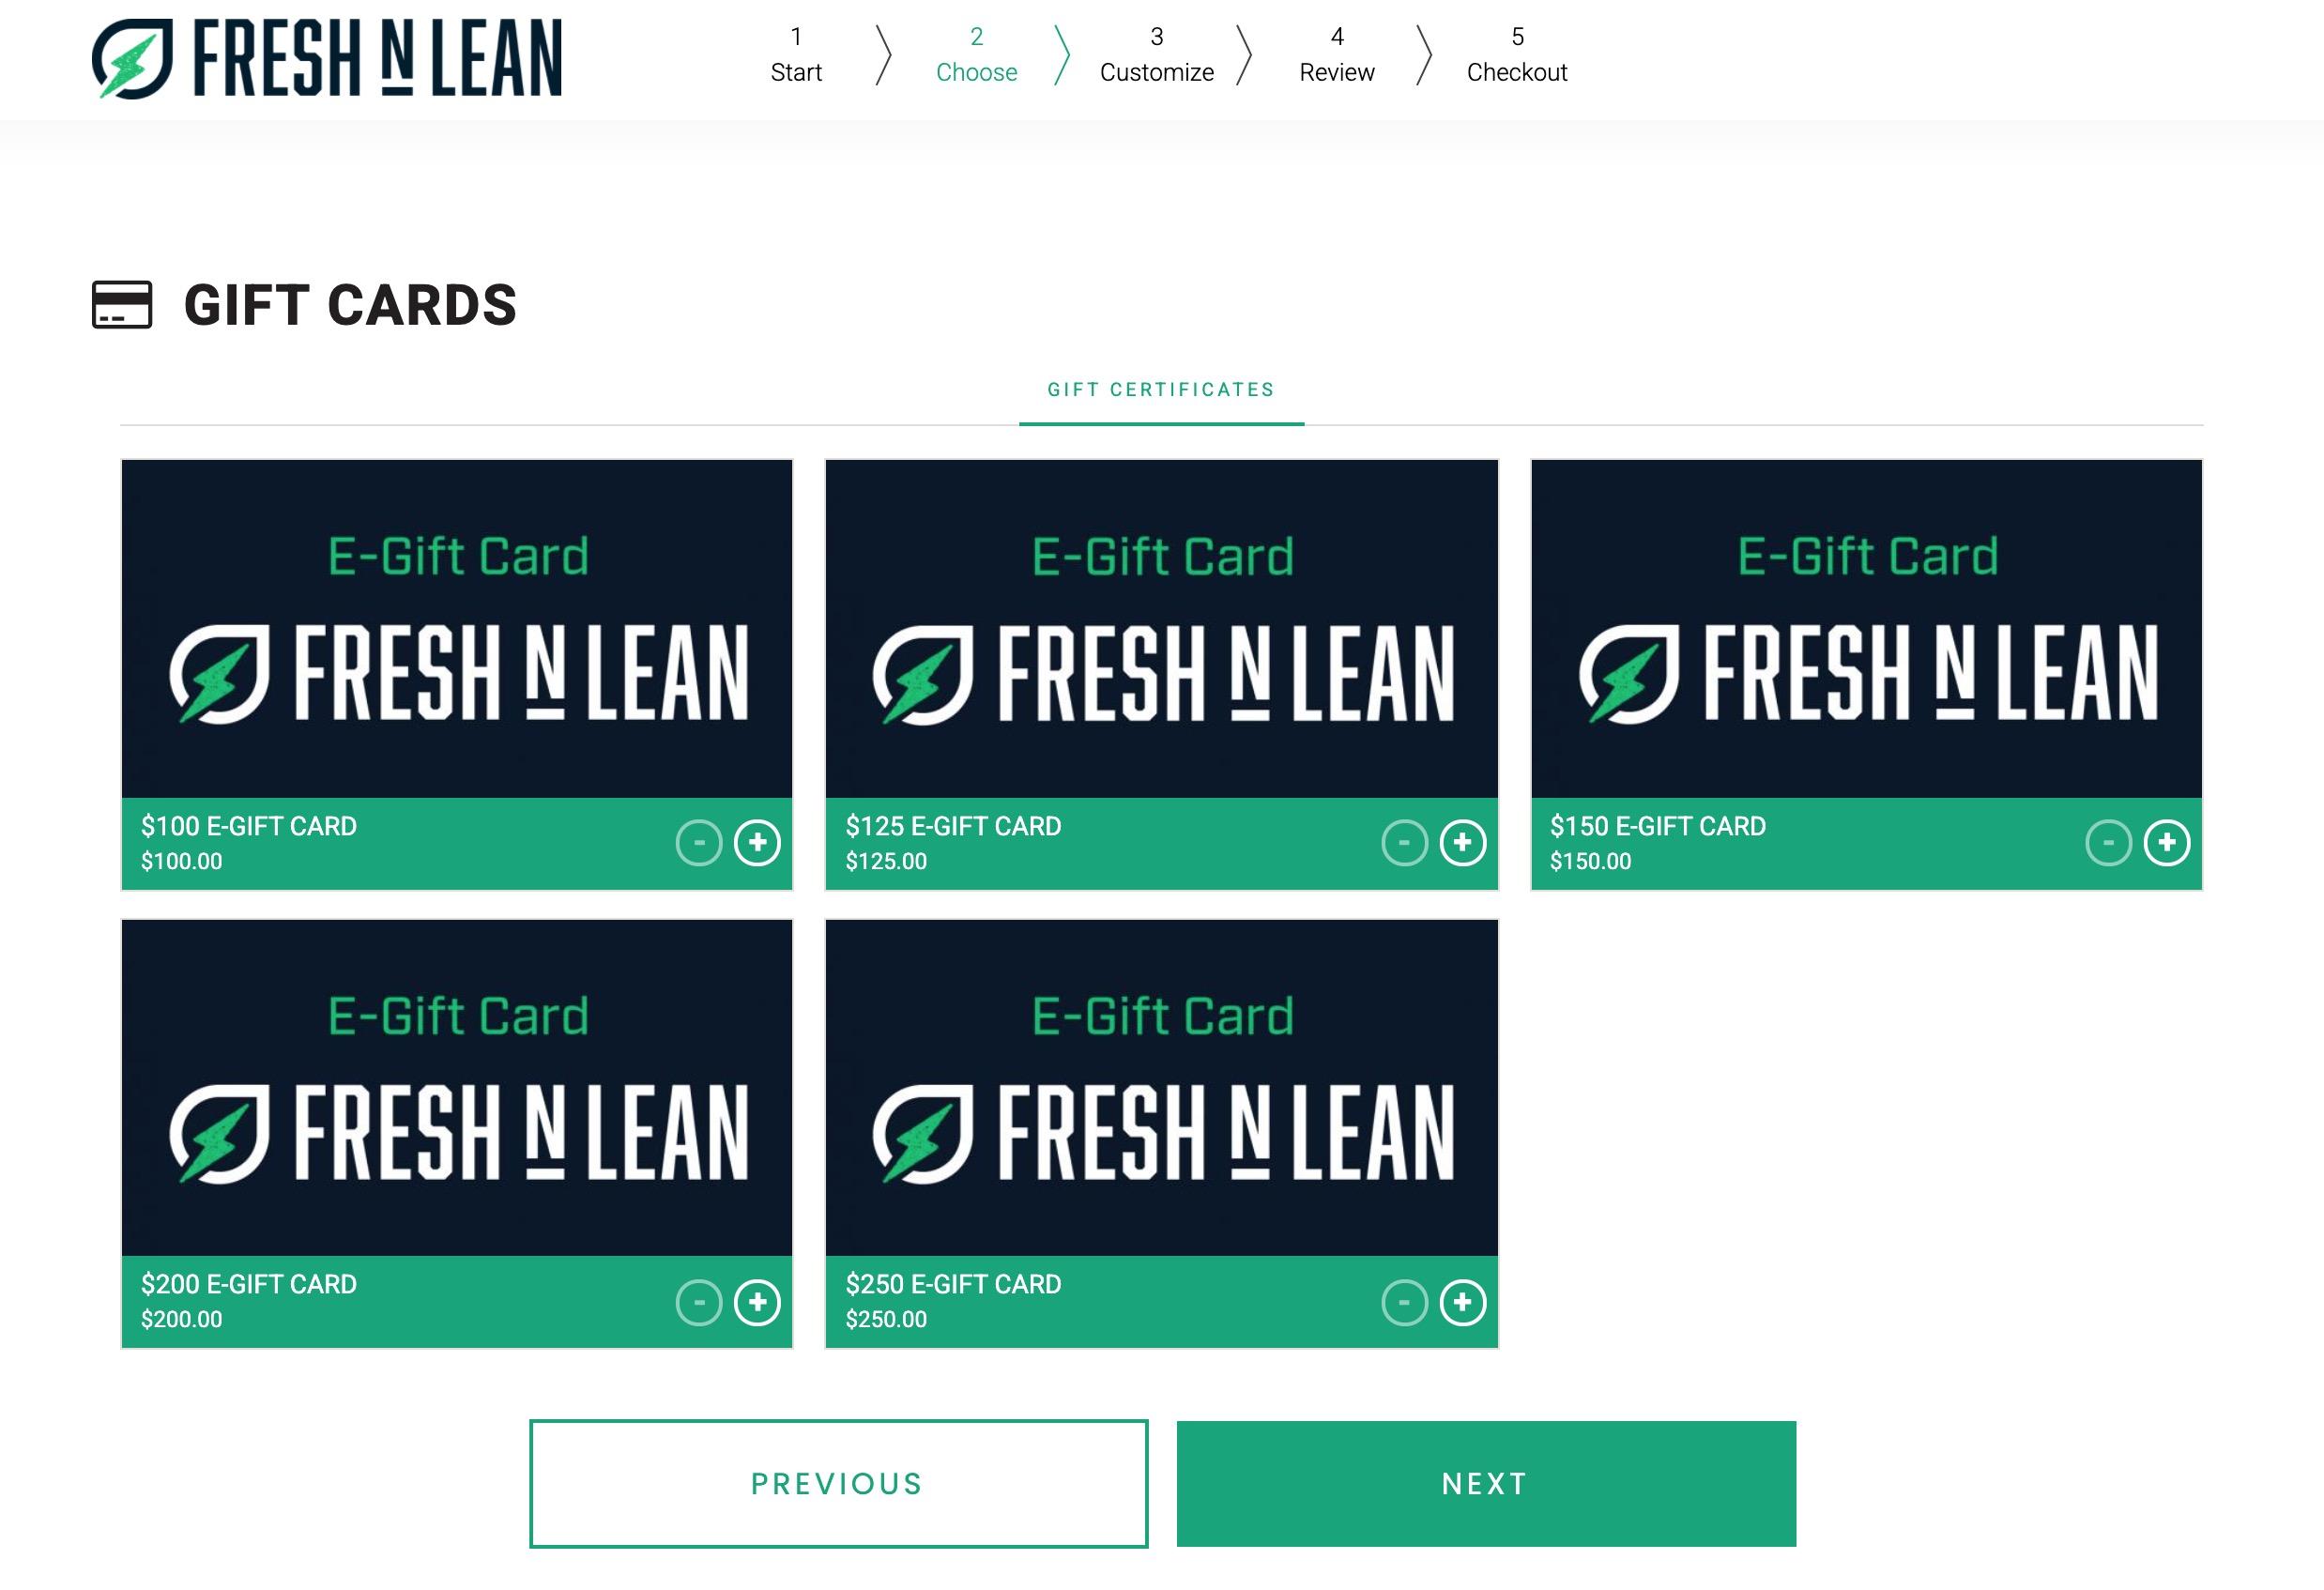 fresh n lean gift card